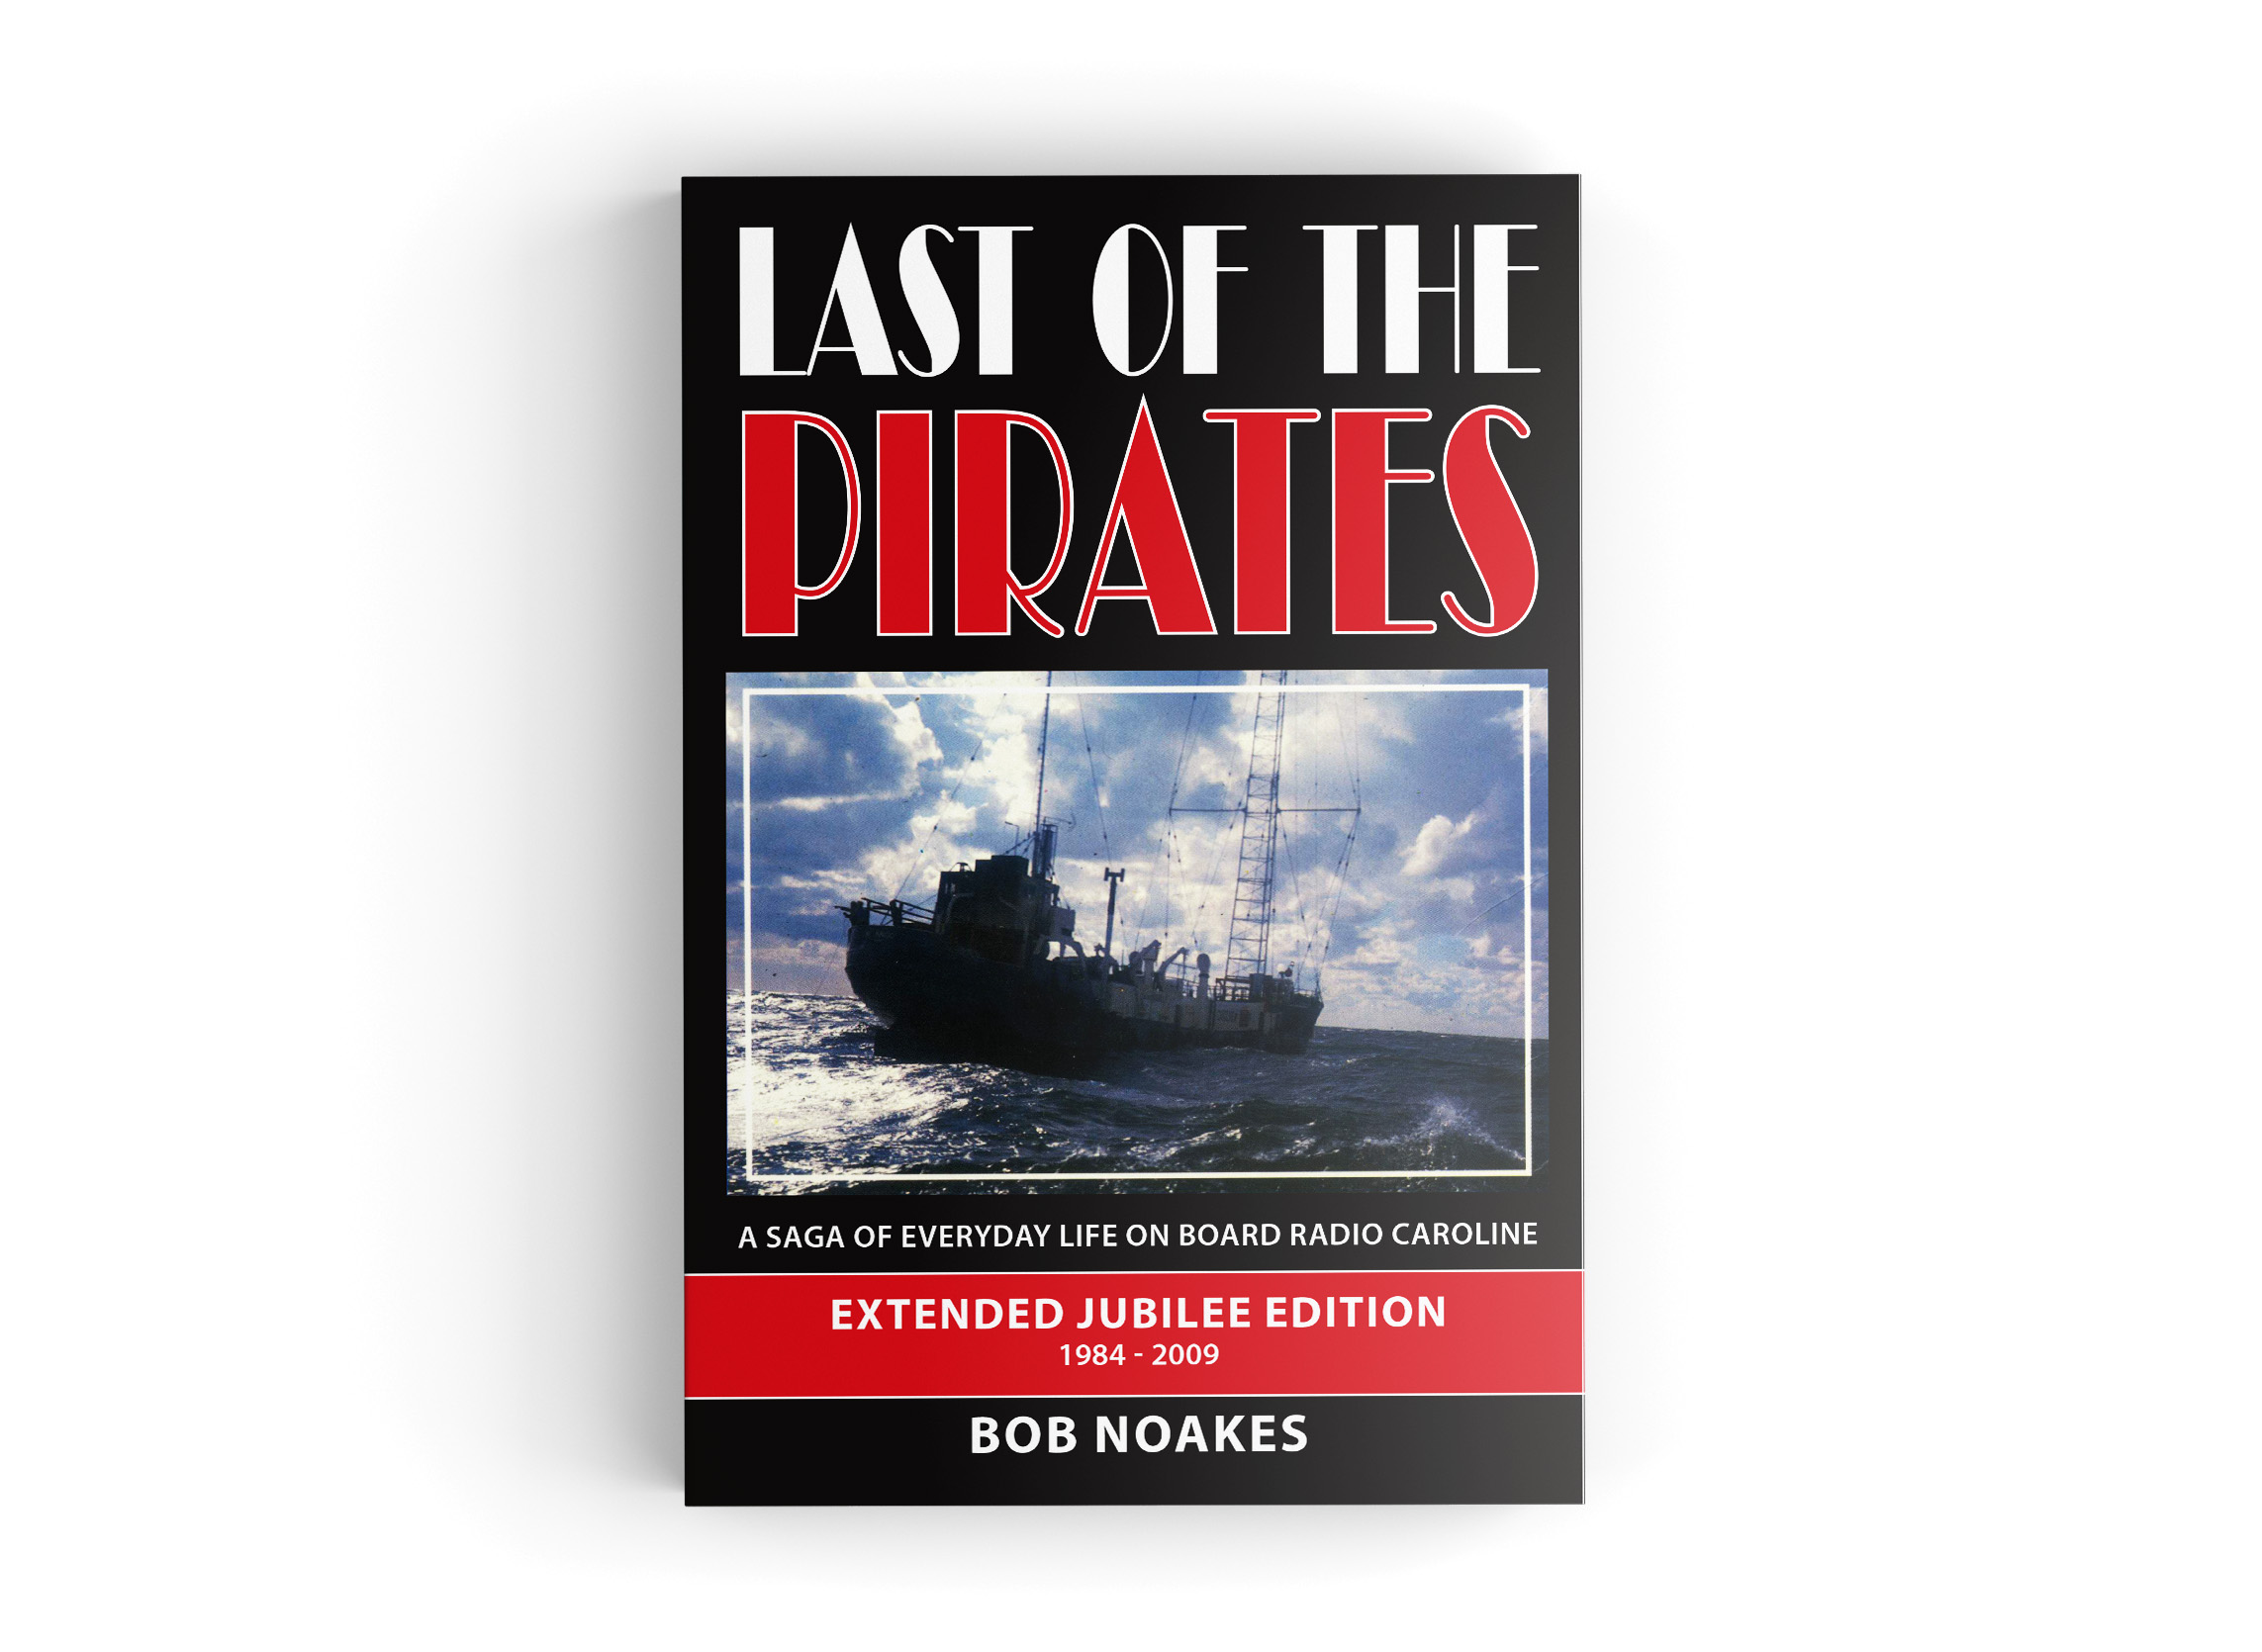 lastofthepirates-book-cover